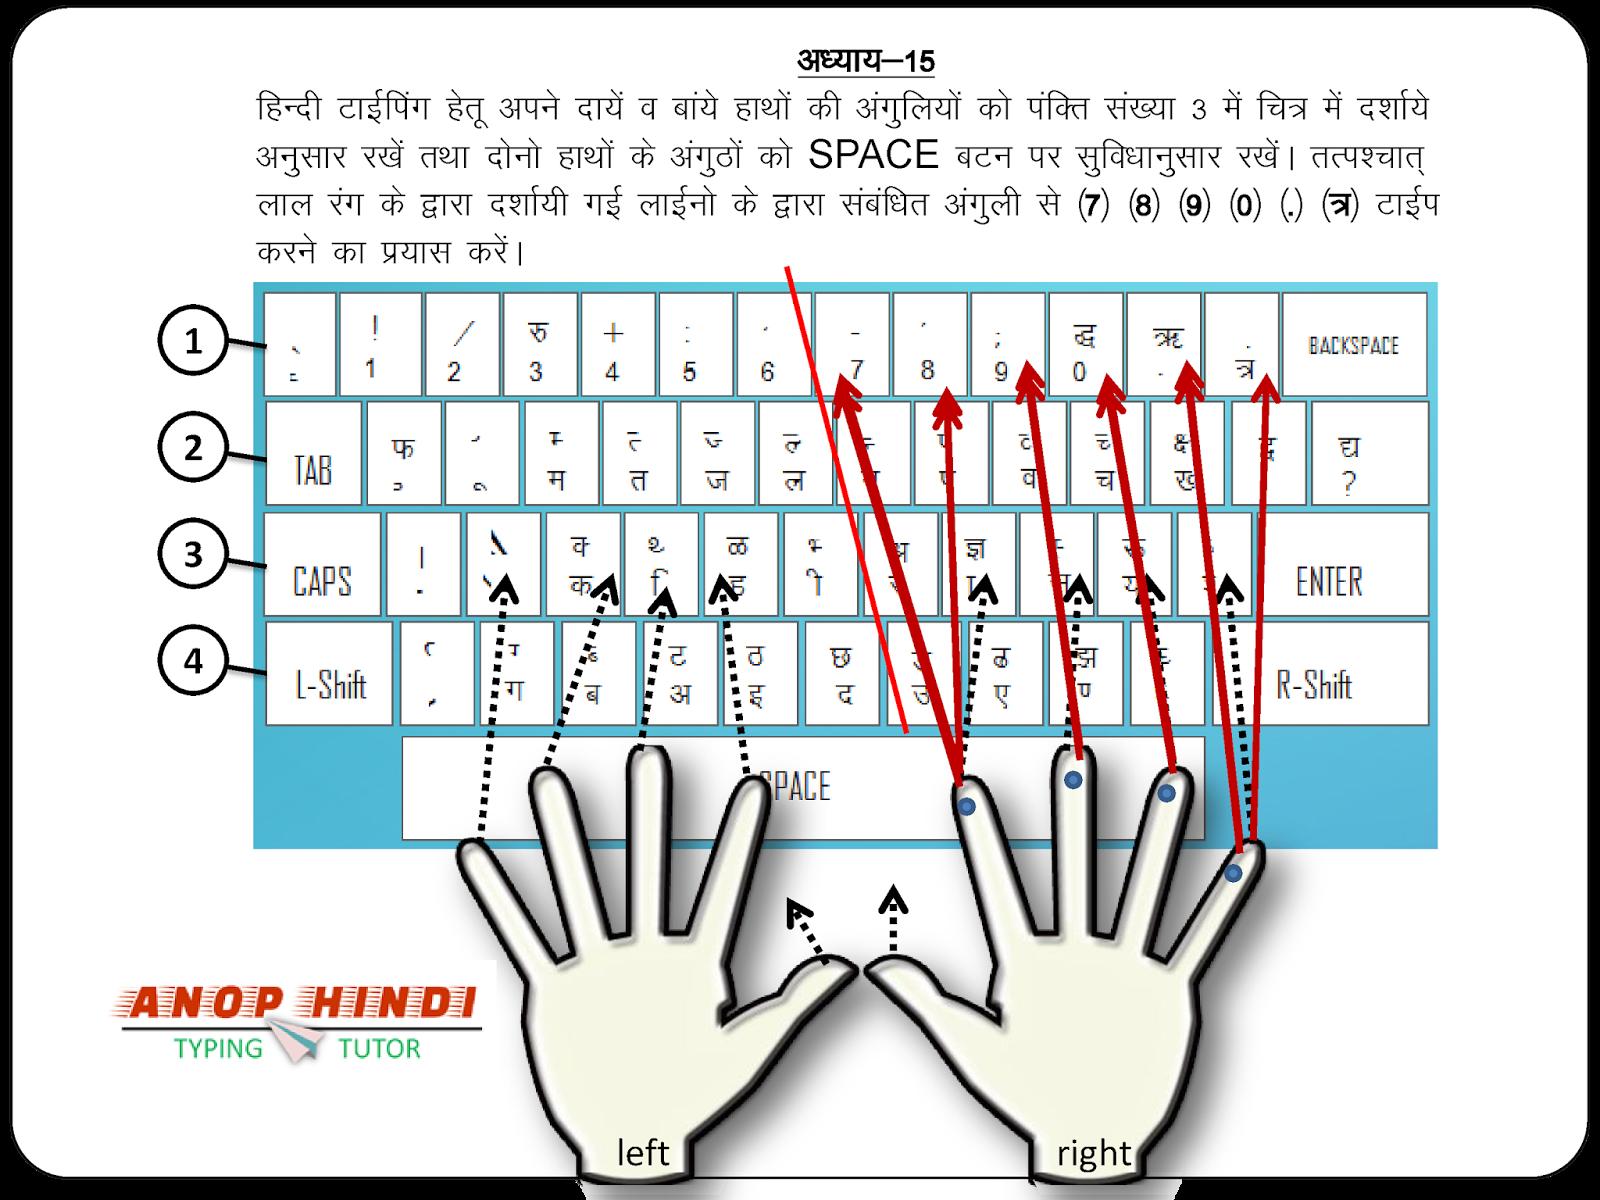 Anop Hindi Typing Tutor - Lesson 15